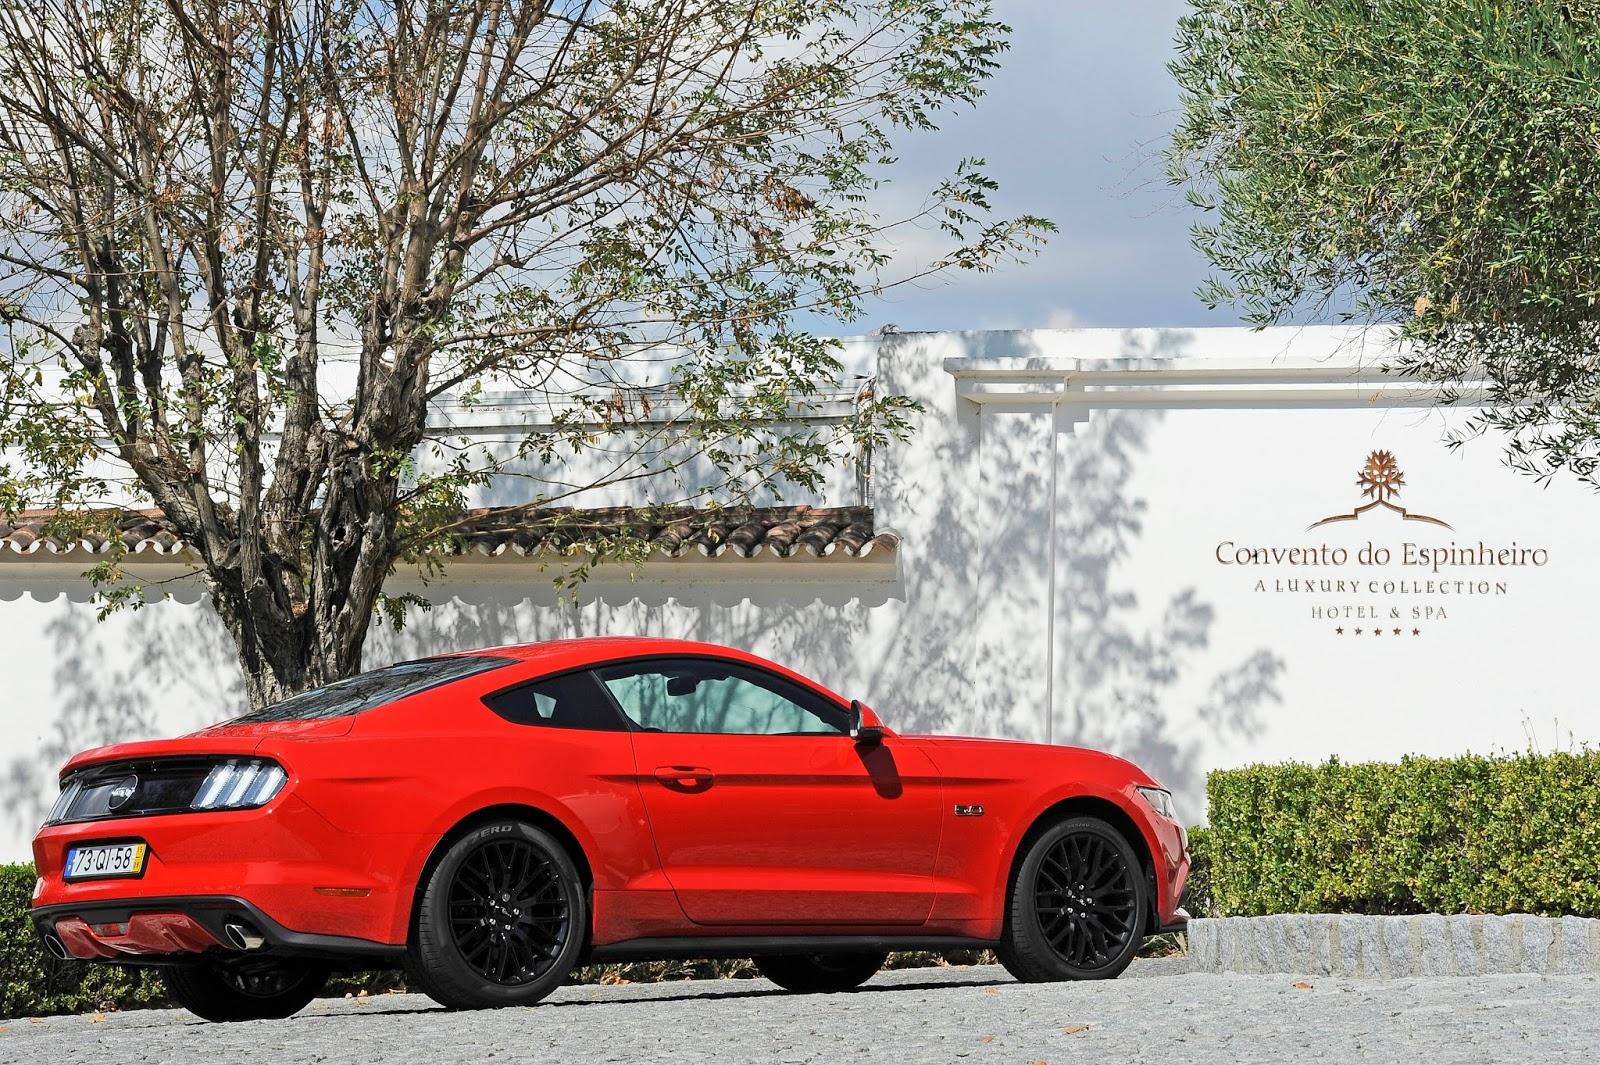 Best SellingSportsCar MustangPortugal Ο... τυφώνας Ford Mustang εξαπλώνεται σε όλο τον κόσμο και ξεπουλάει! Bestseller, cabrio, Ford Mustang, Muscle cars, Sales, πωλήσεις, πωλήσεις αυτοκινήτων